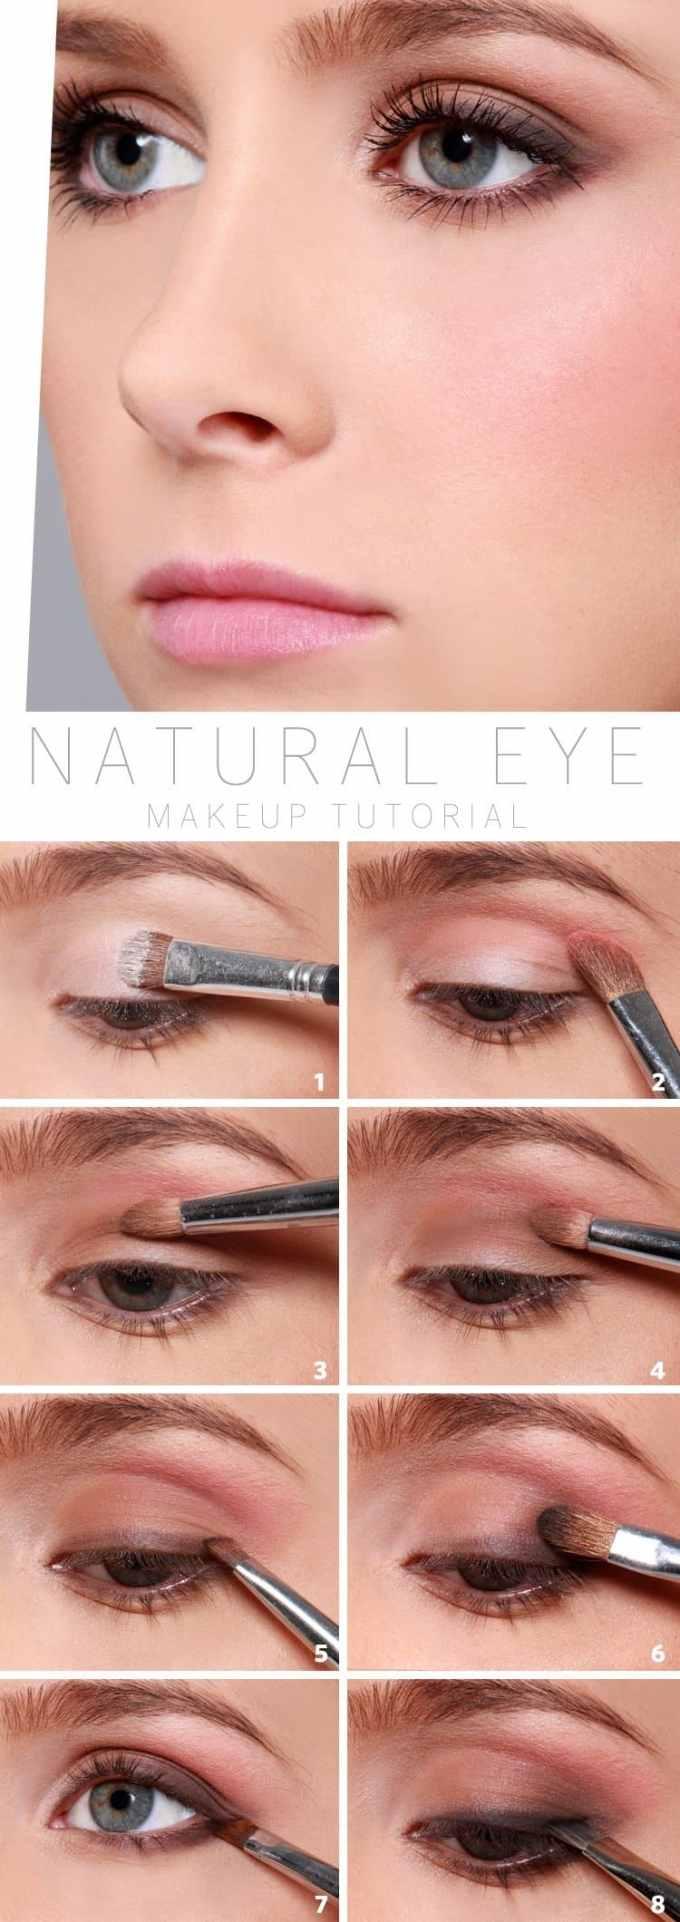 go from beginner to expert with 10 eye makeup tutorials